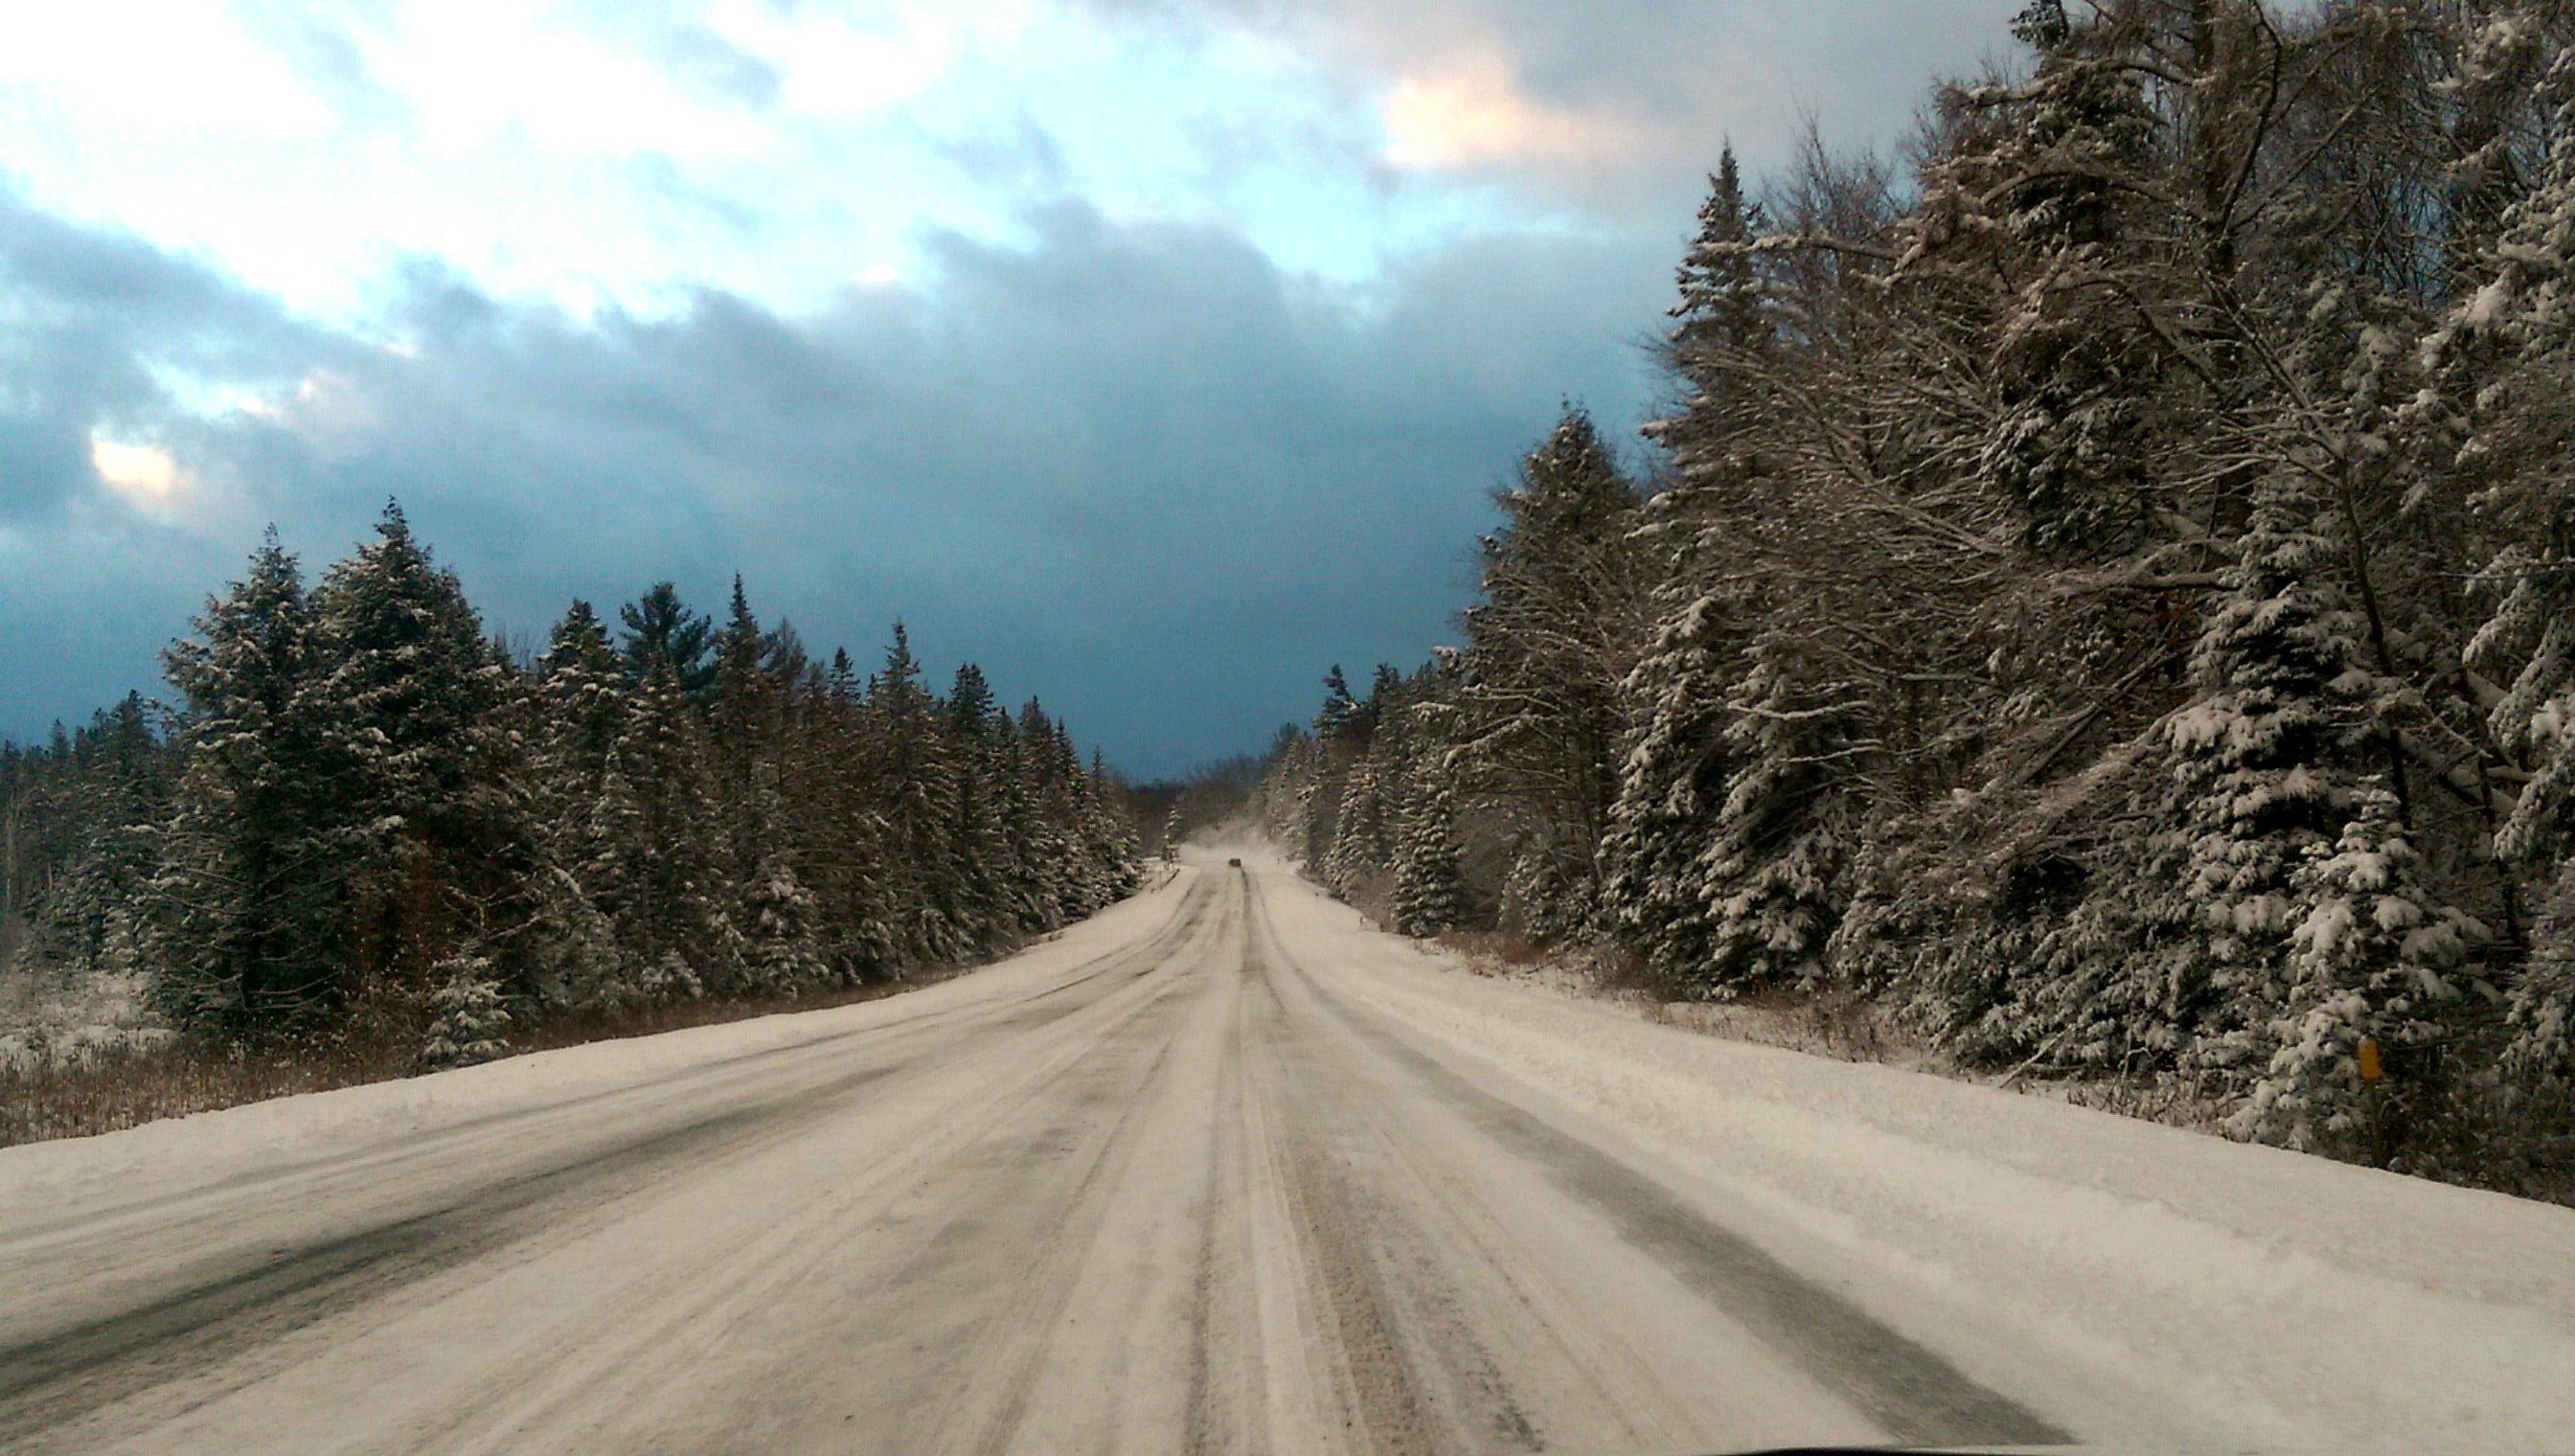 Entering the Adirondacks